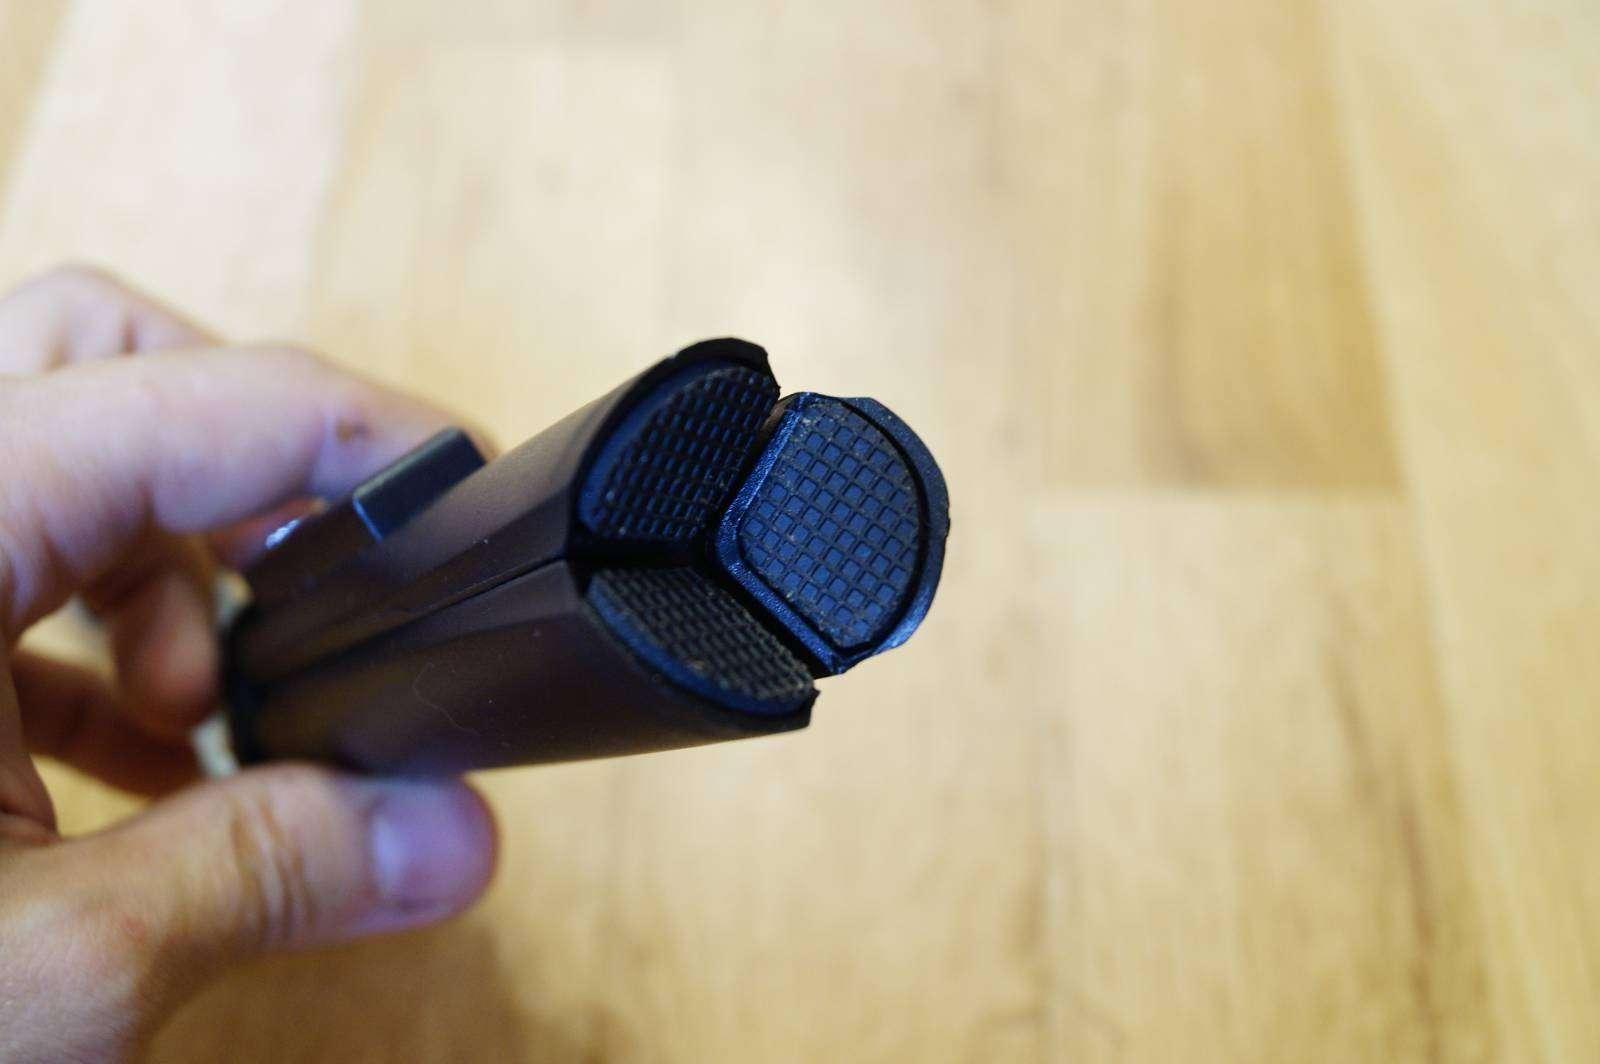 GearBest: Gepro устройство два в одном.